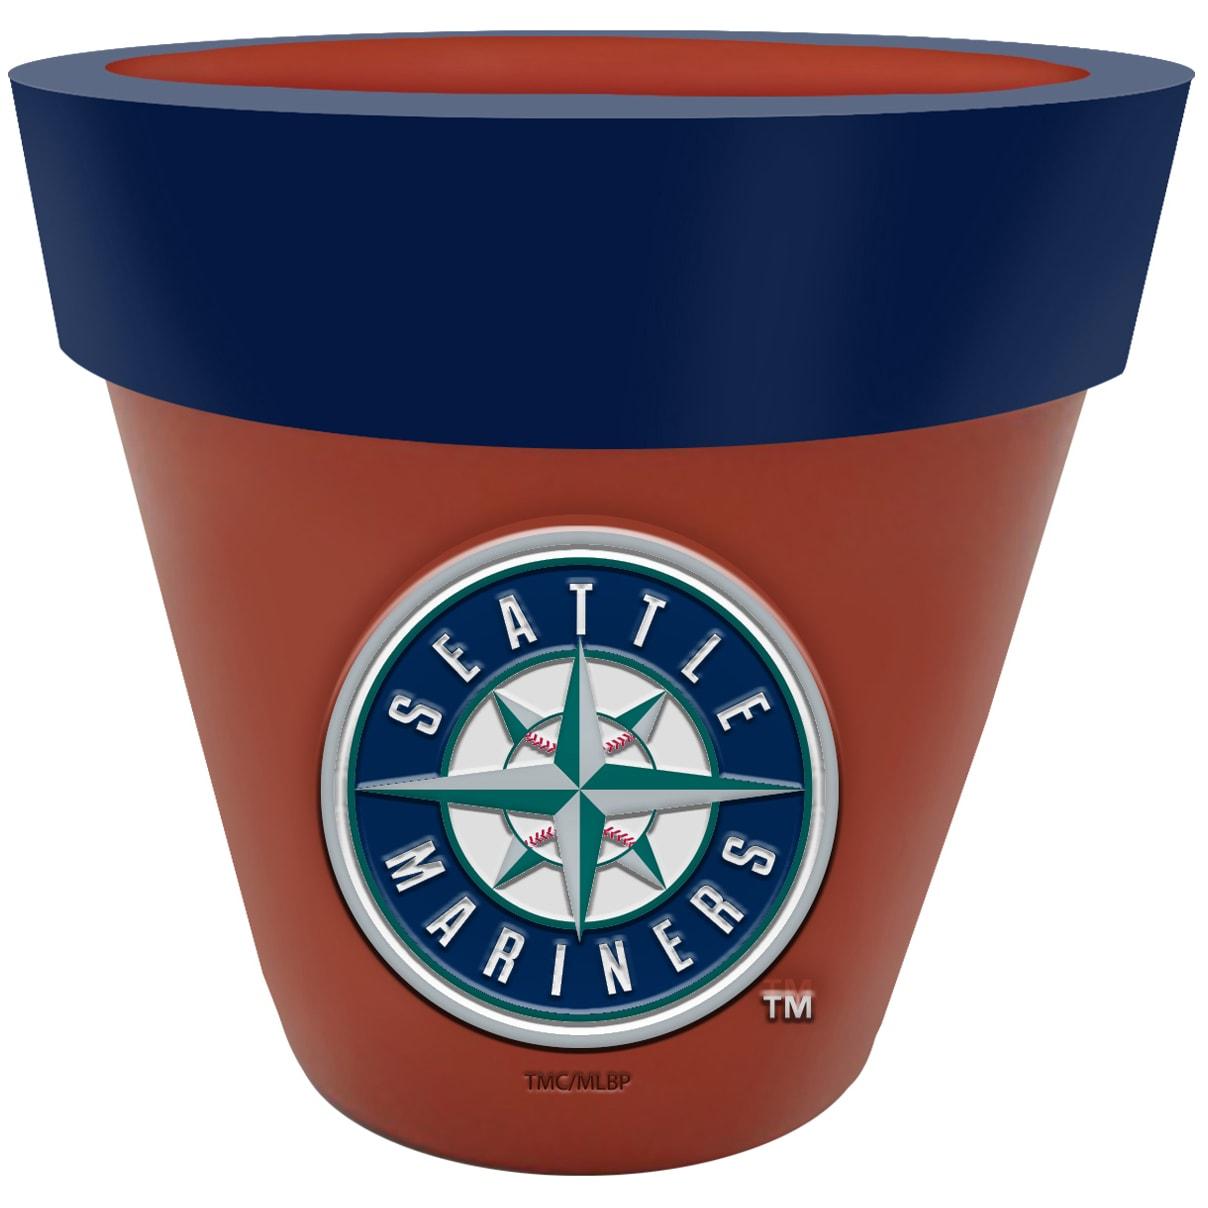 Seattle Mariners Team Planter Flower Pot